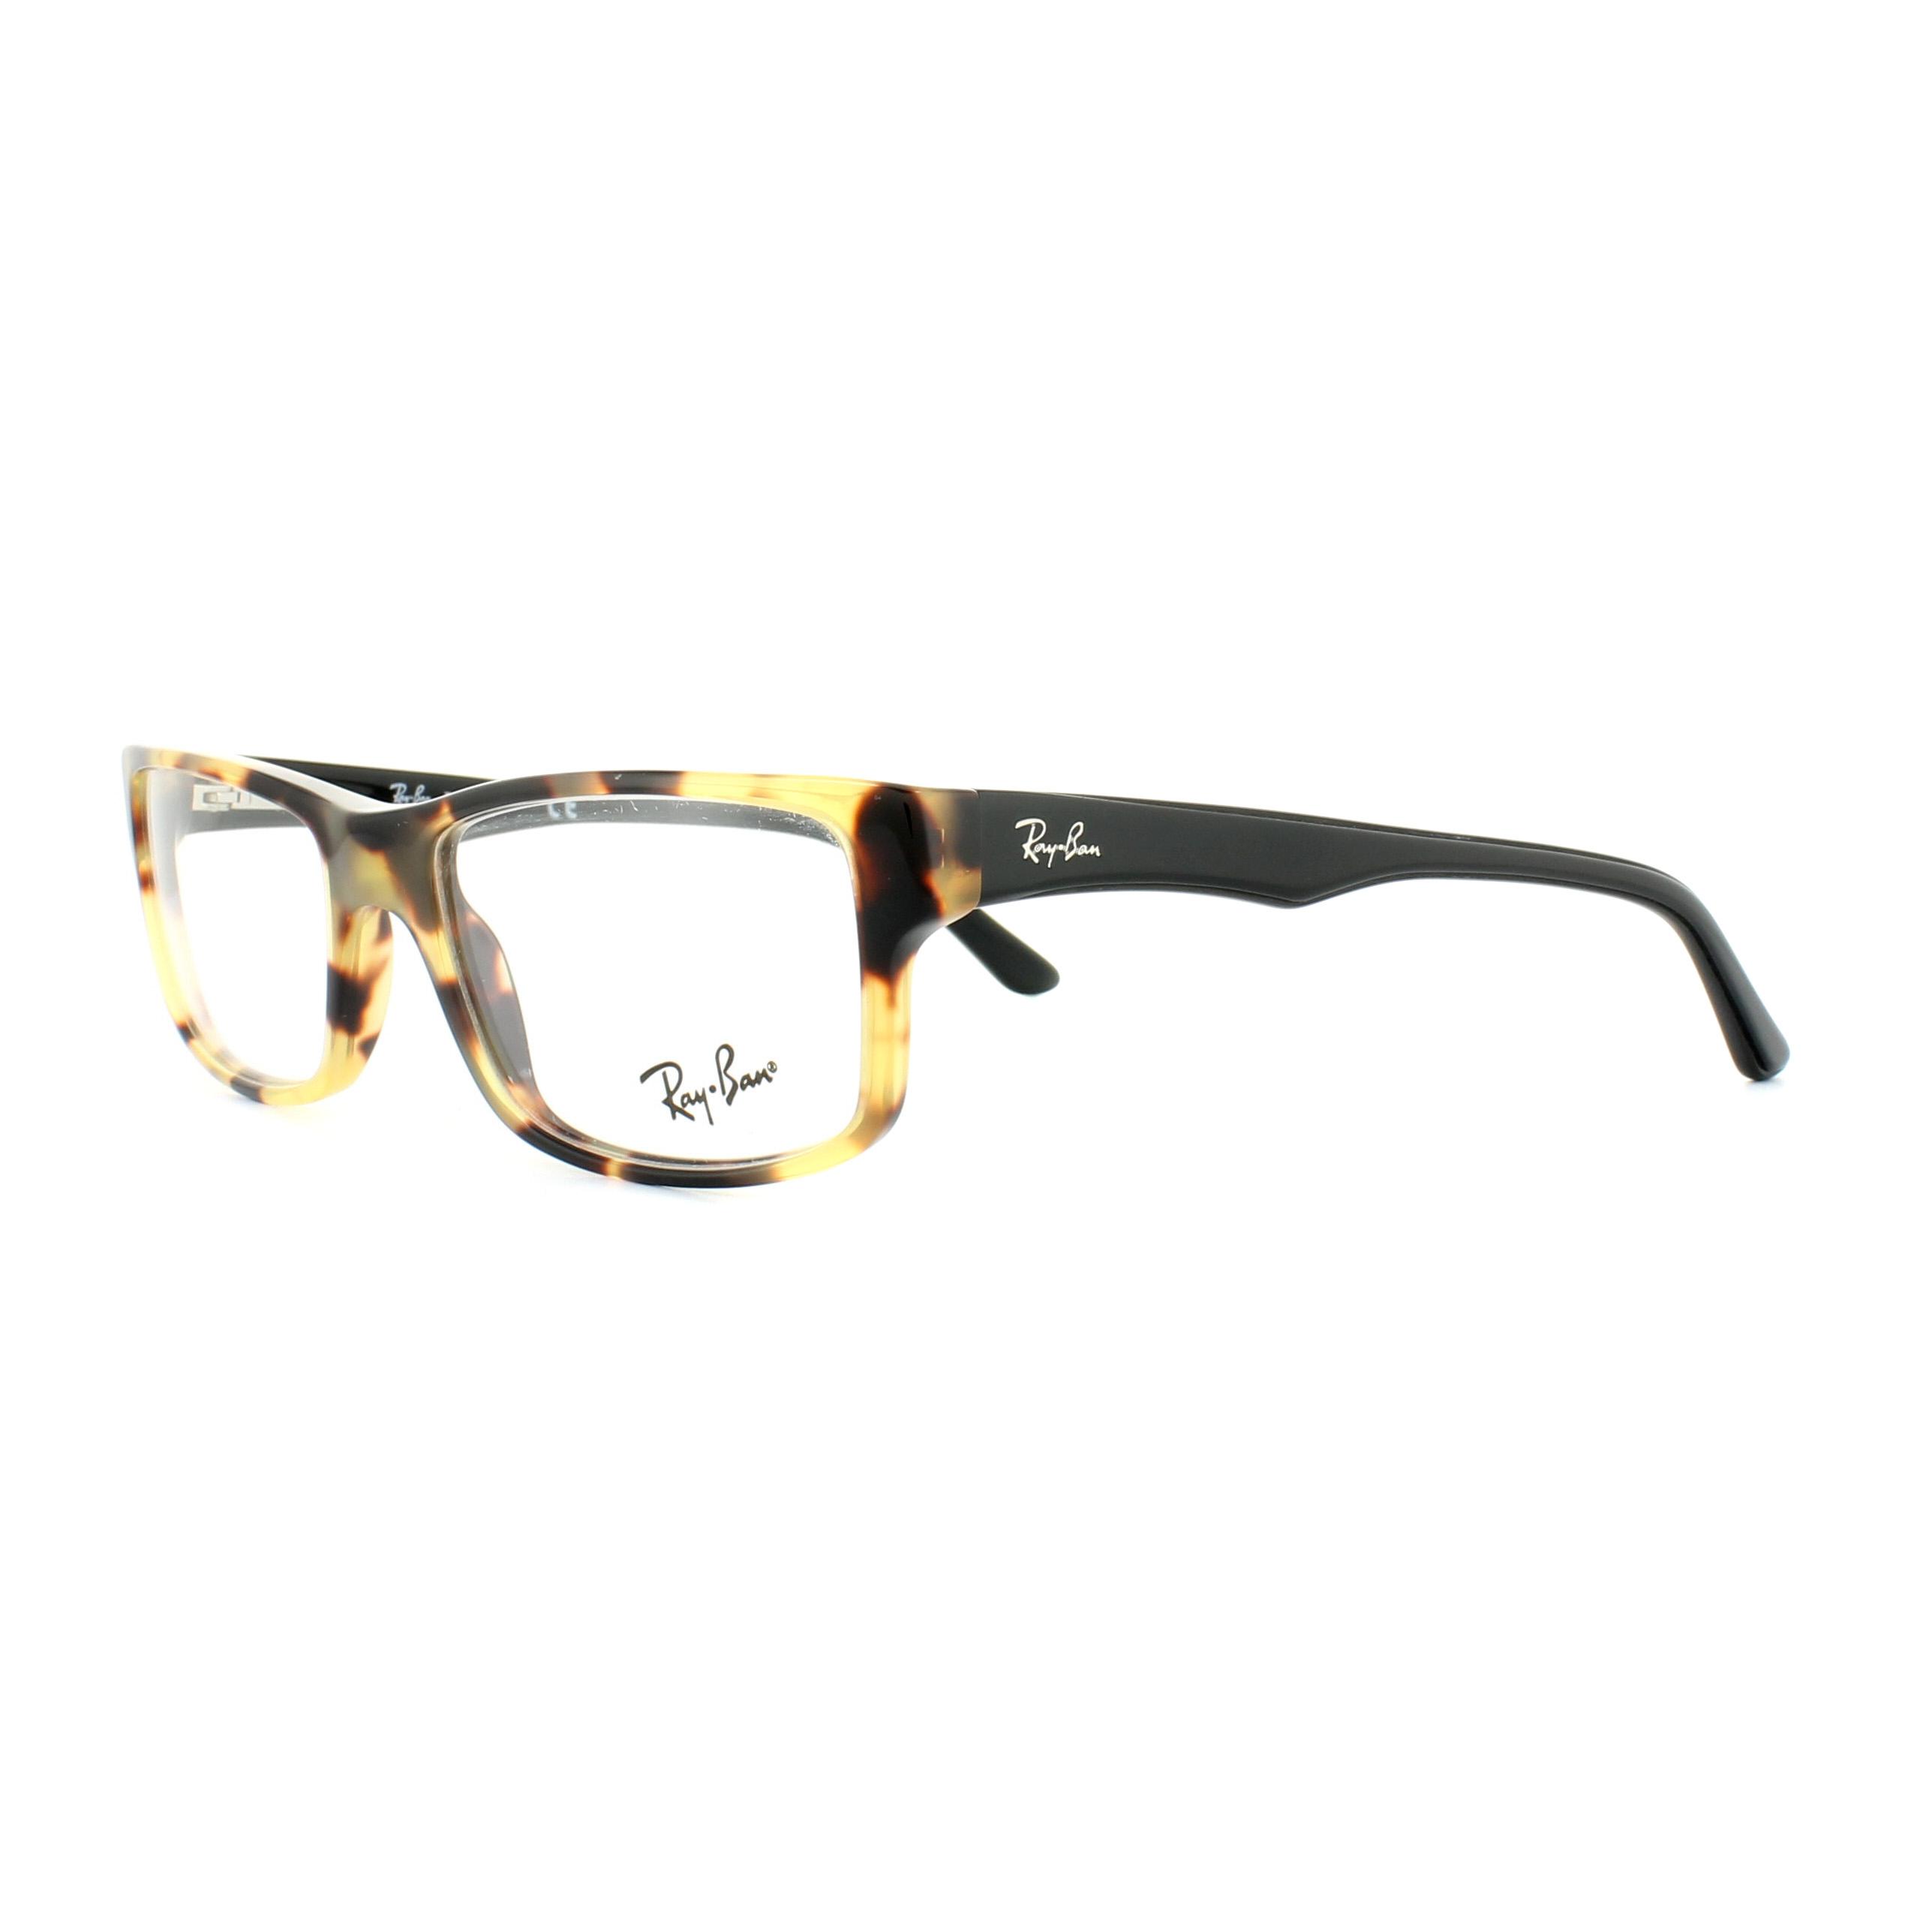 19e223b8de Sentinel Ray-Ban Glasses Frames 5245 5608 Yellow Tortoise Black 52mm Mens